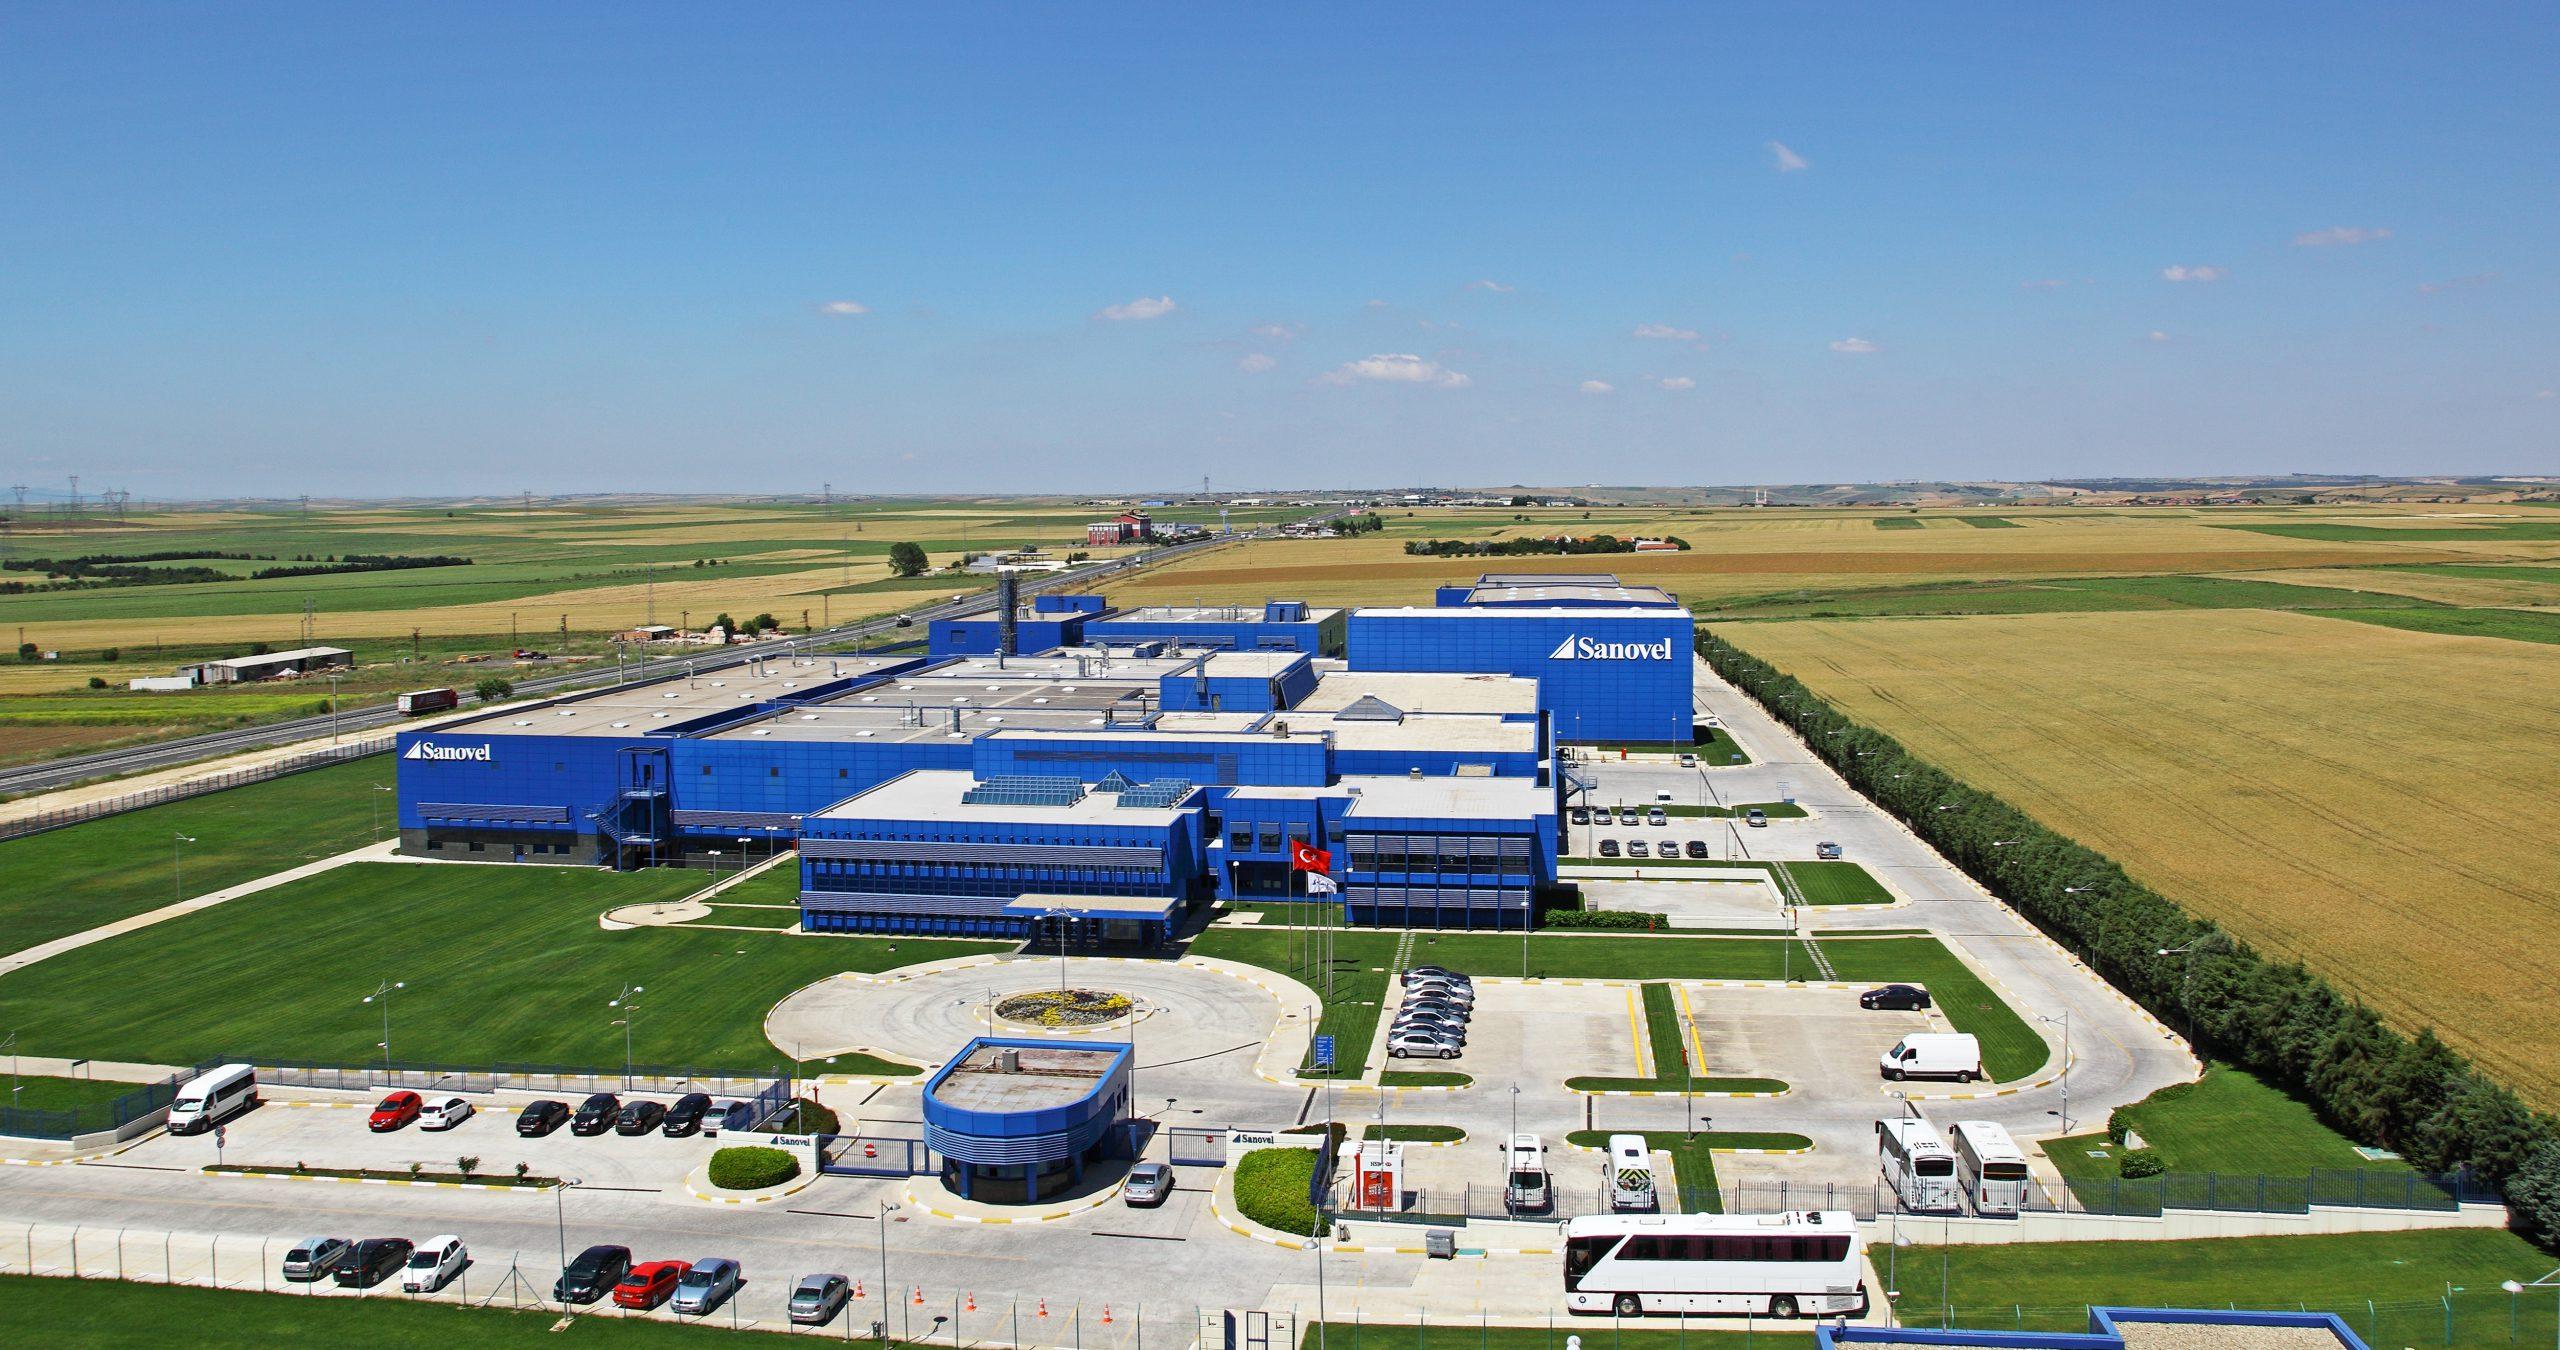 toksoz-grup-sanovel-in-30-hissesini-200-milyon-dolar-karsiliginda-yamma-investments-a-sattigini-duyurdu